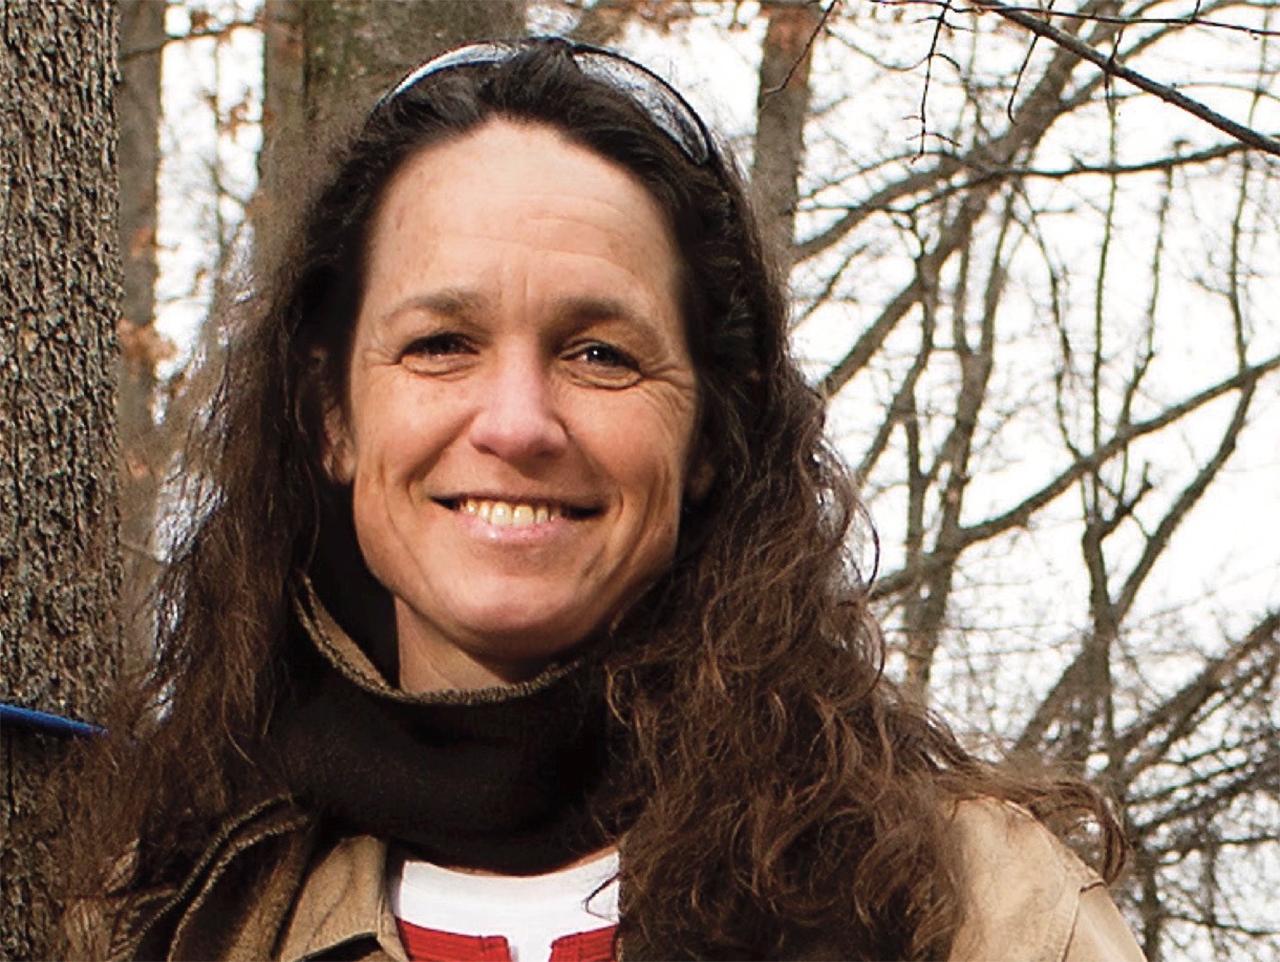 image of Marcella Kelly of Virginia Tech